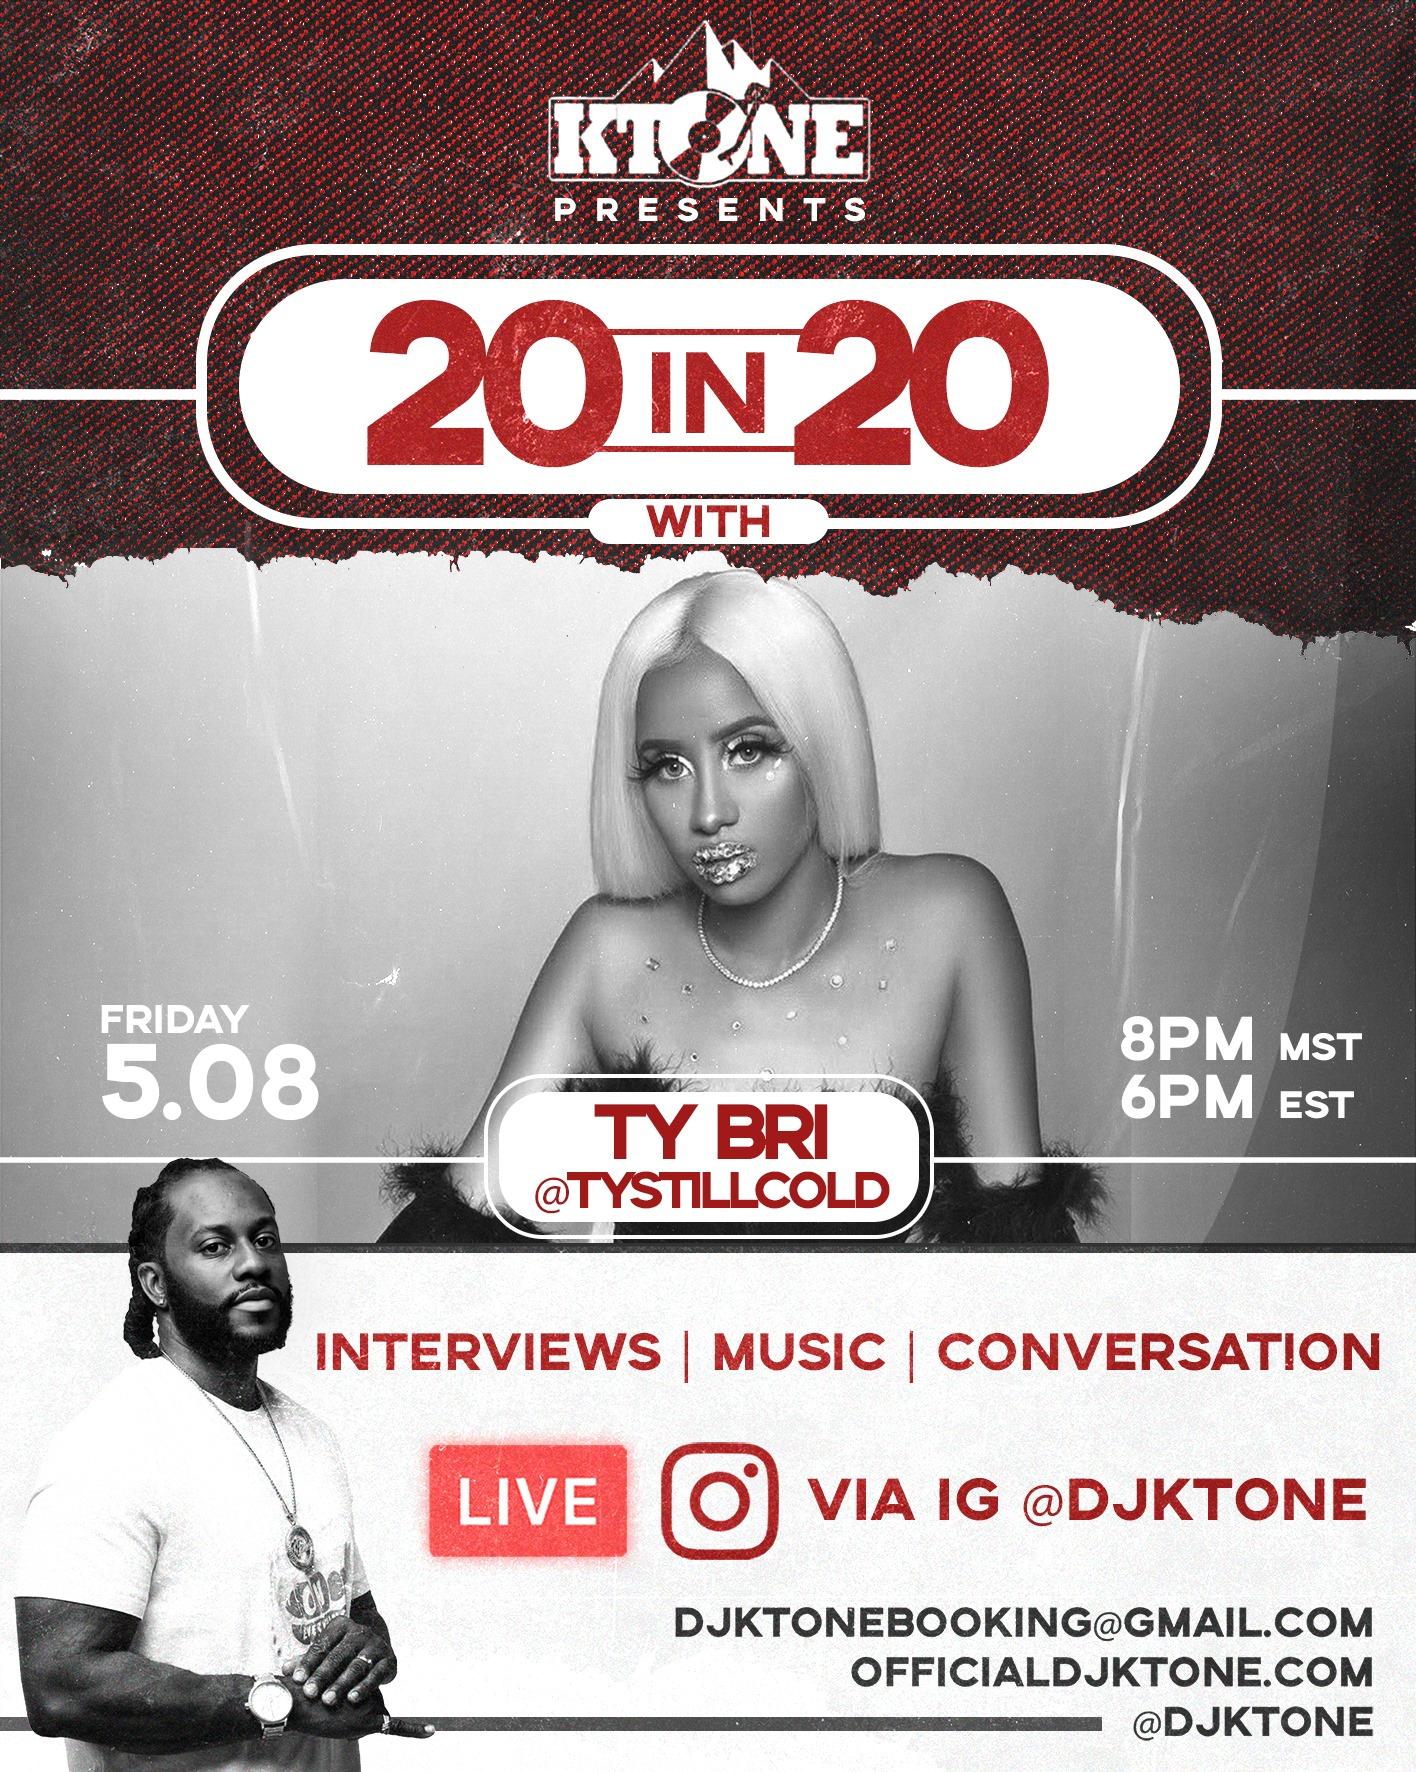 DJ Ktone 20 in 20 with Ty Bri